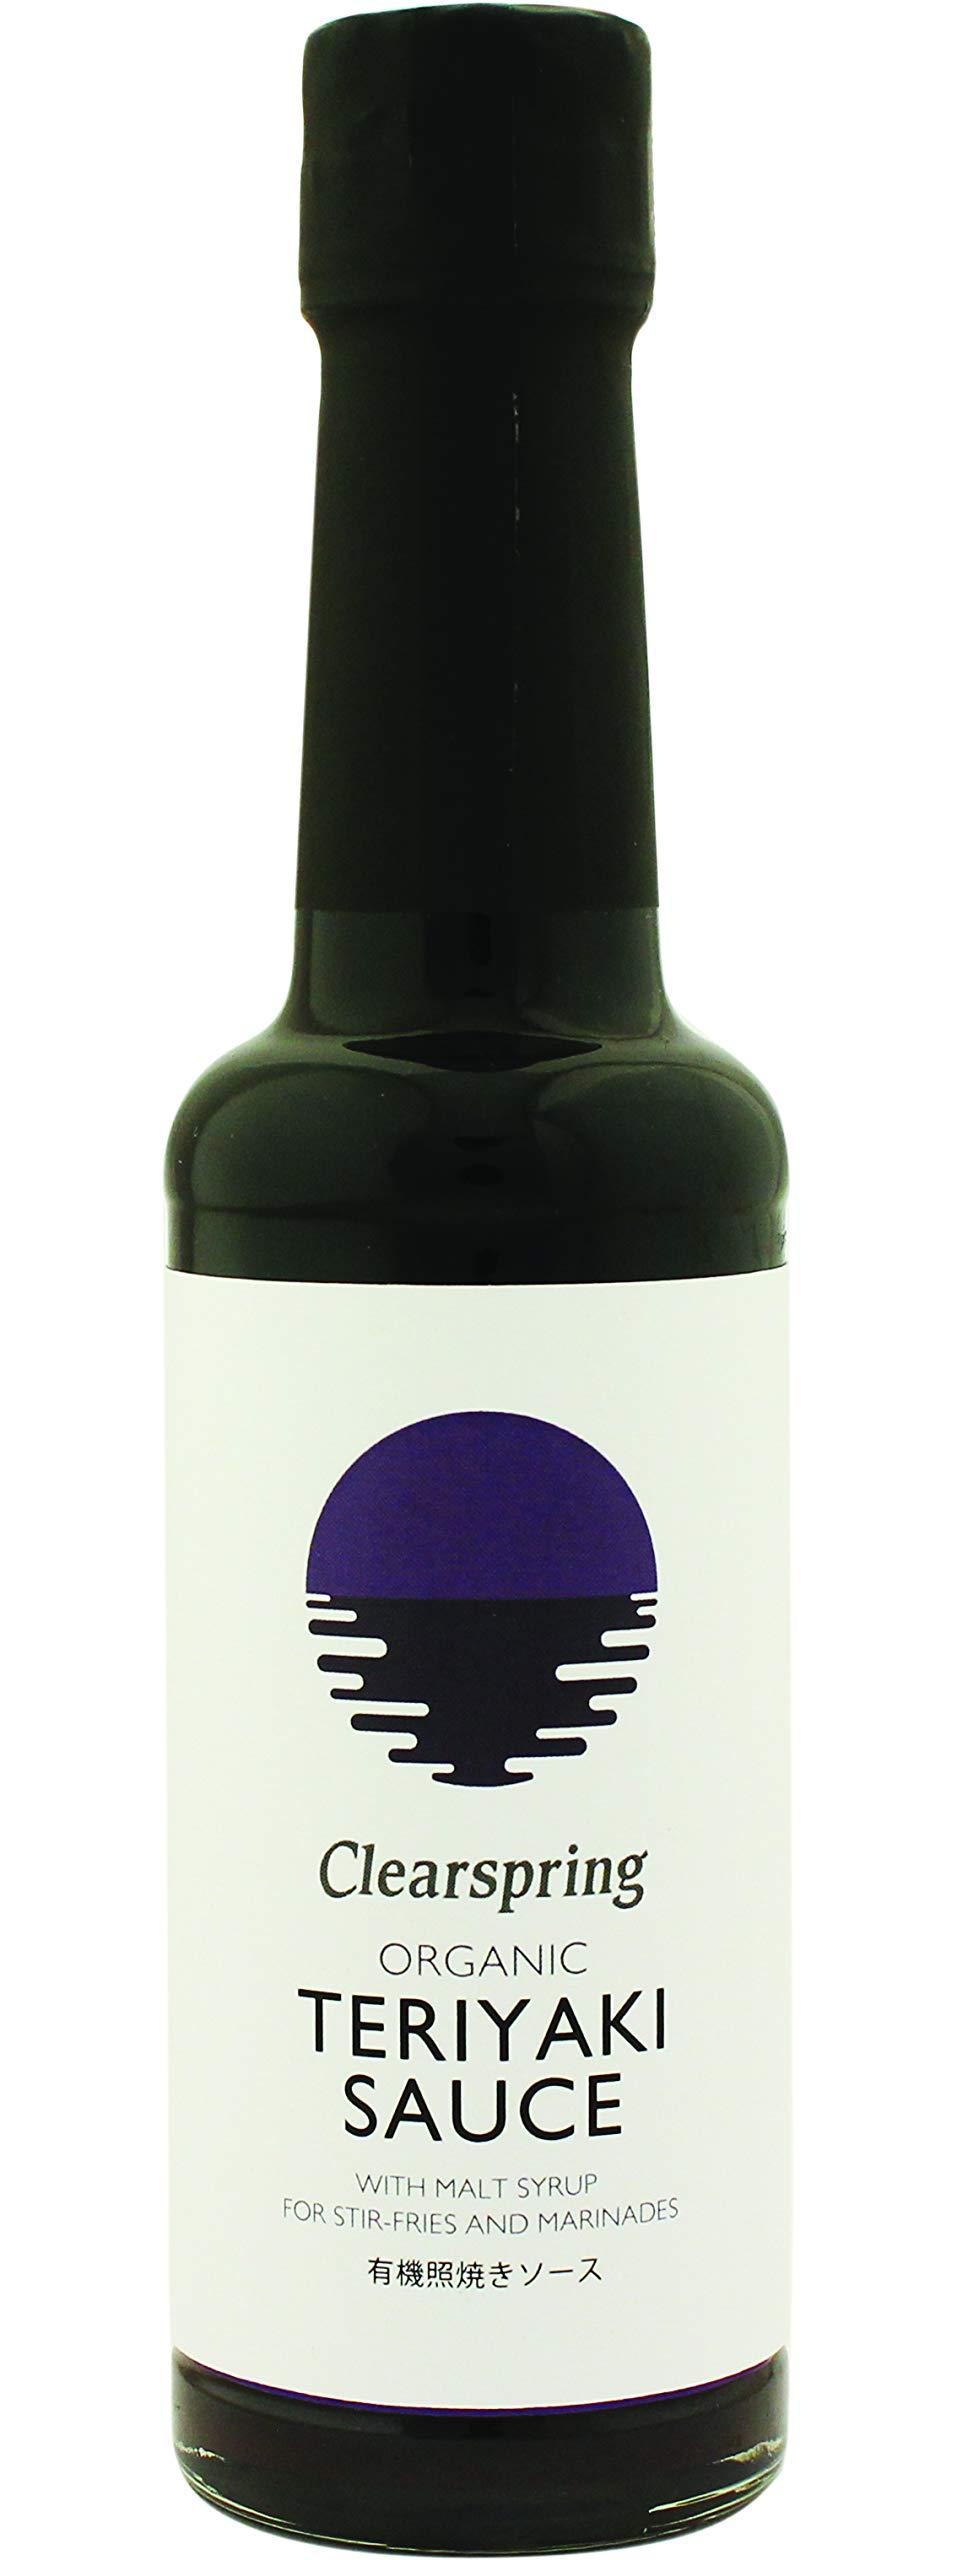 Clearspring Organic Teriyaki Sauce (150ml) - Pack of 6